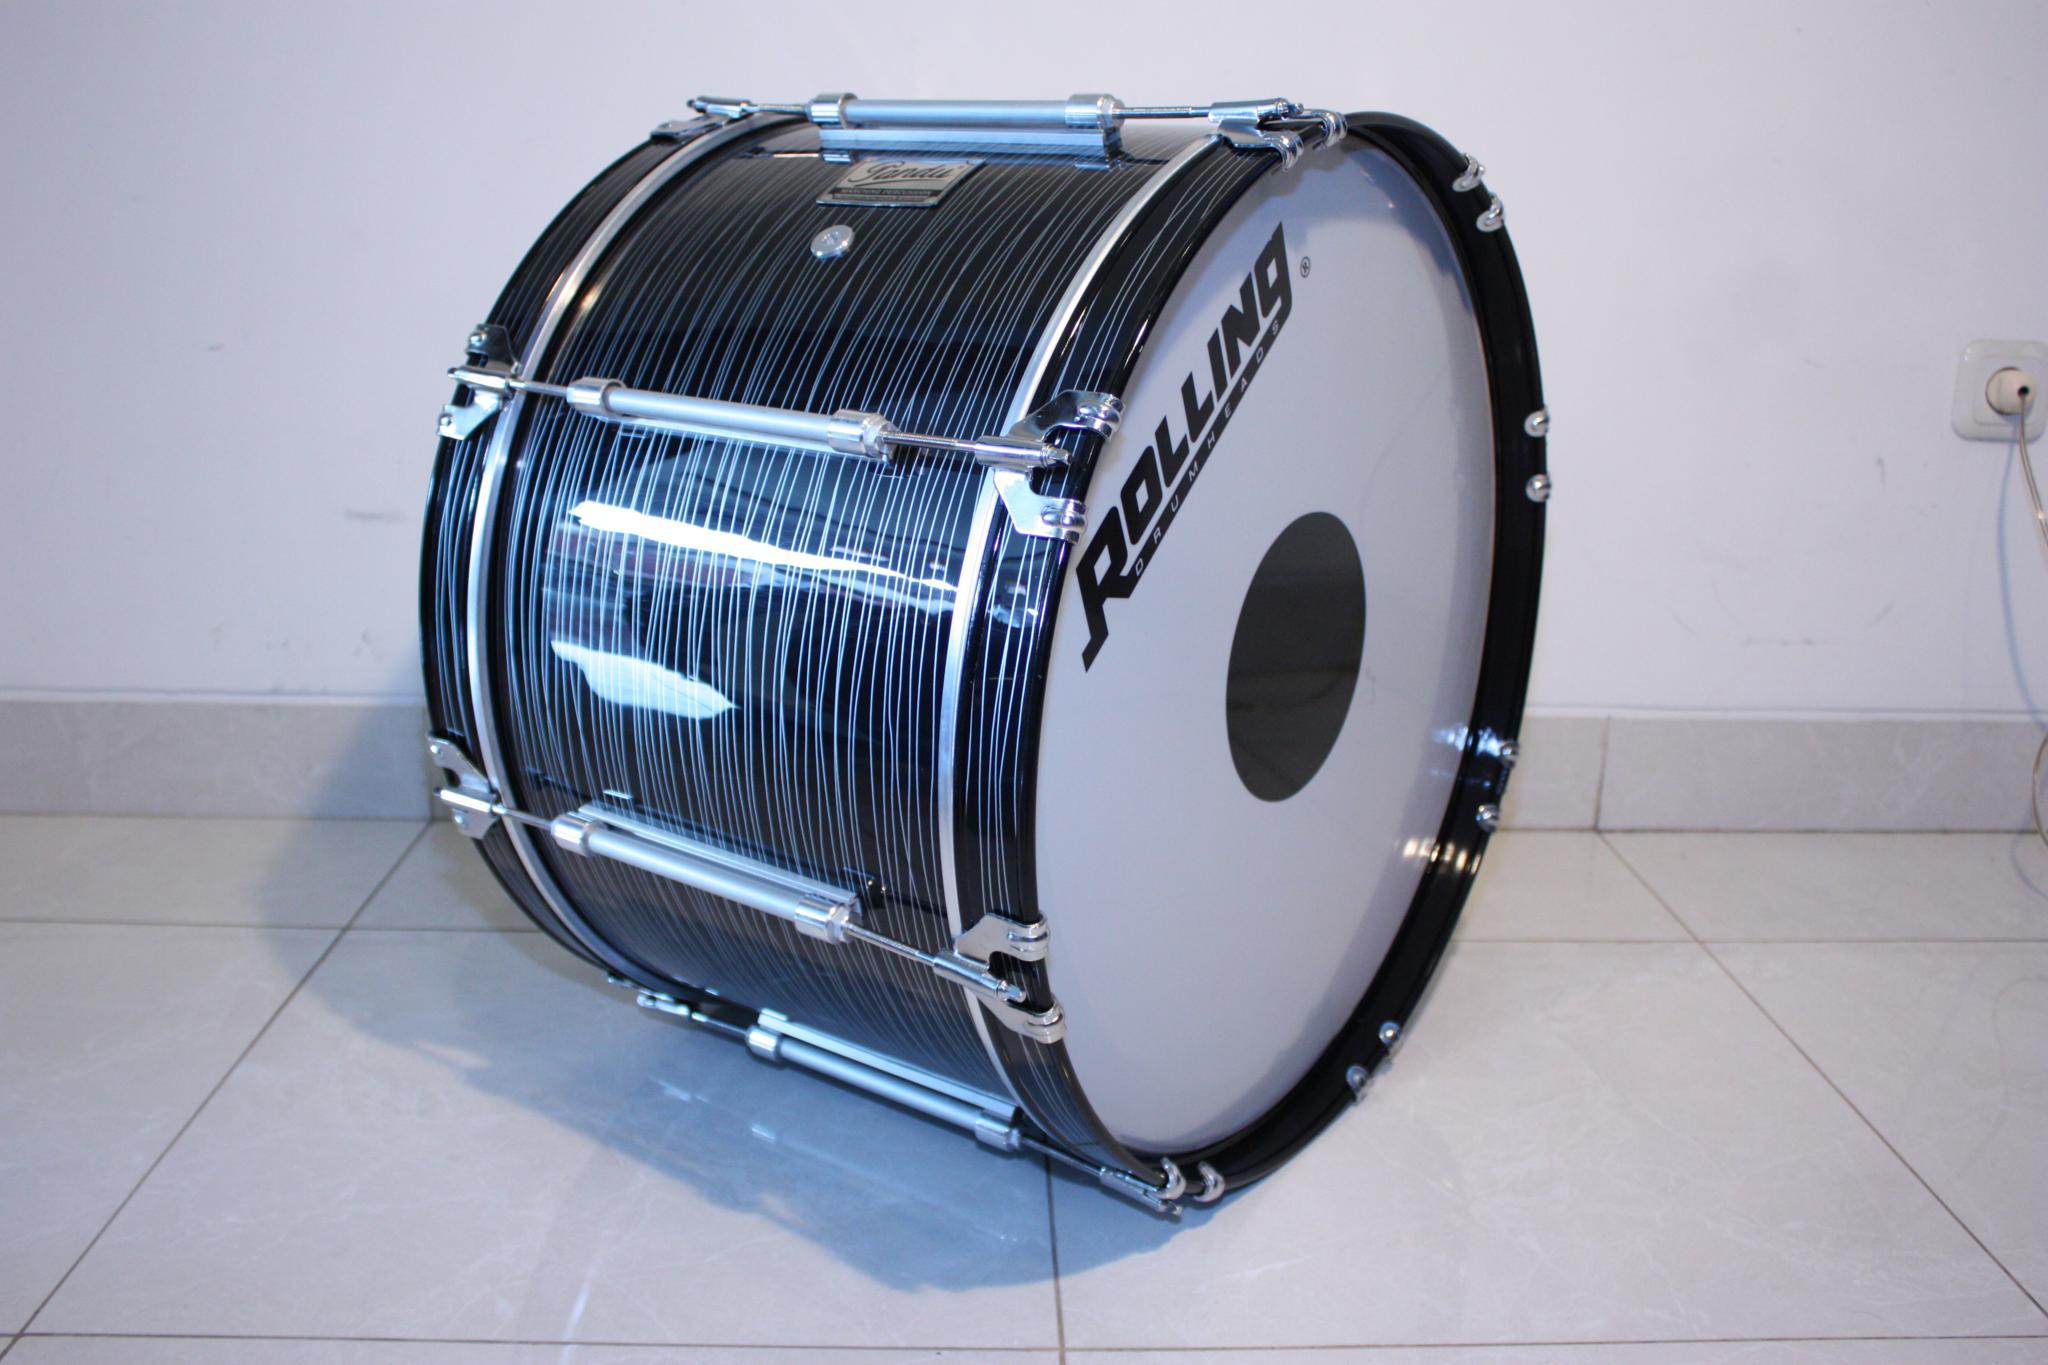 marchingband-full-hts-bass-drum-sd-model-yamaha_2048x1365